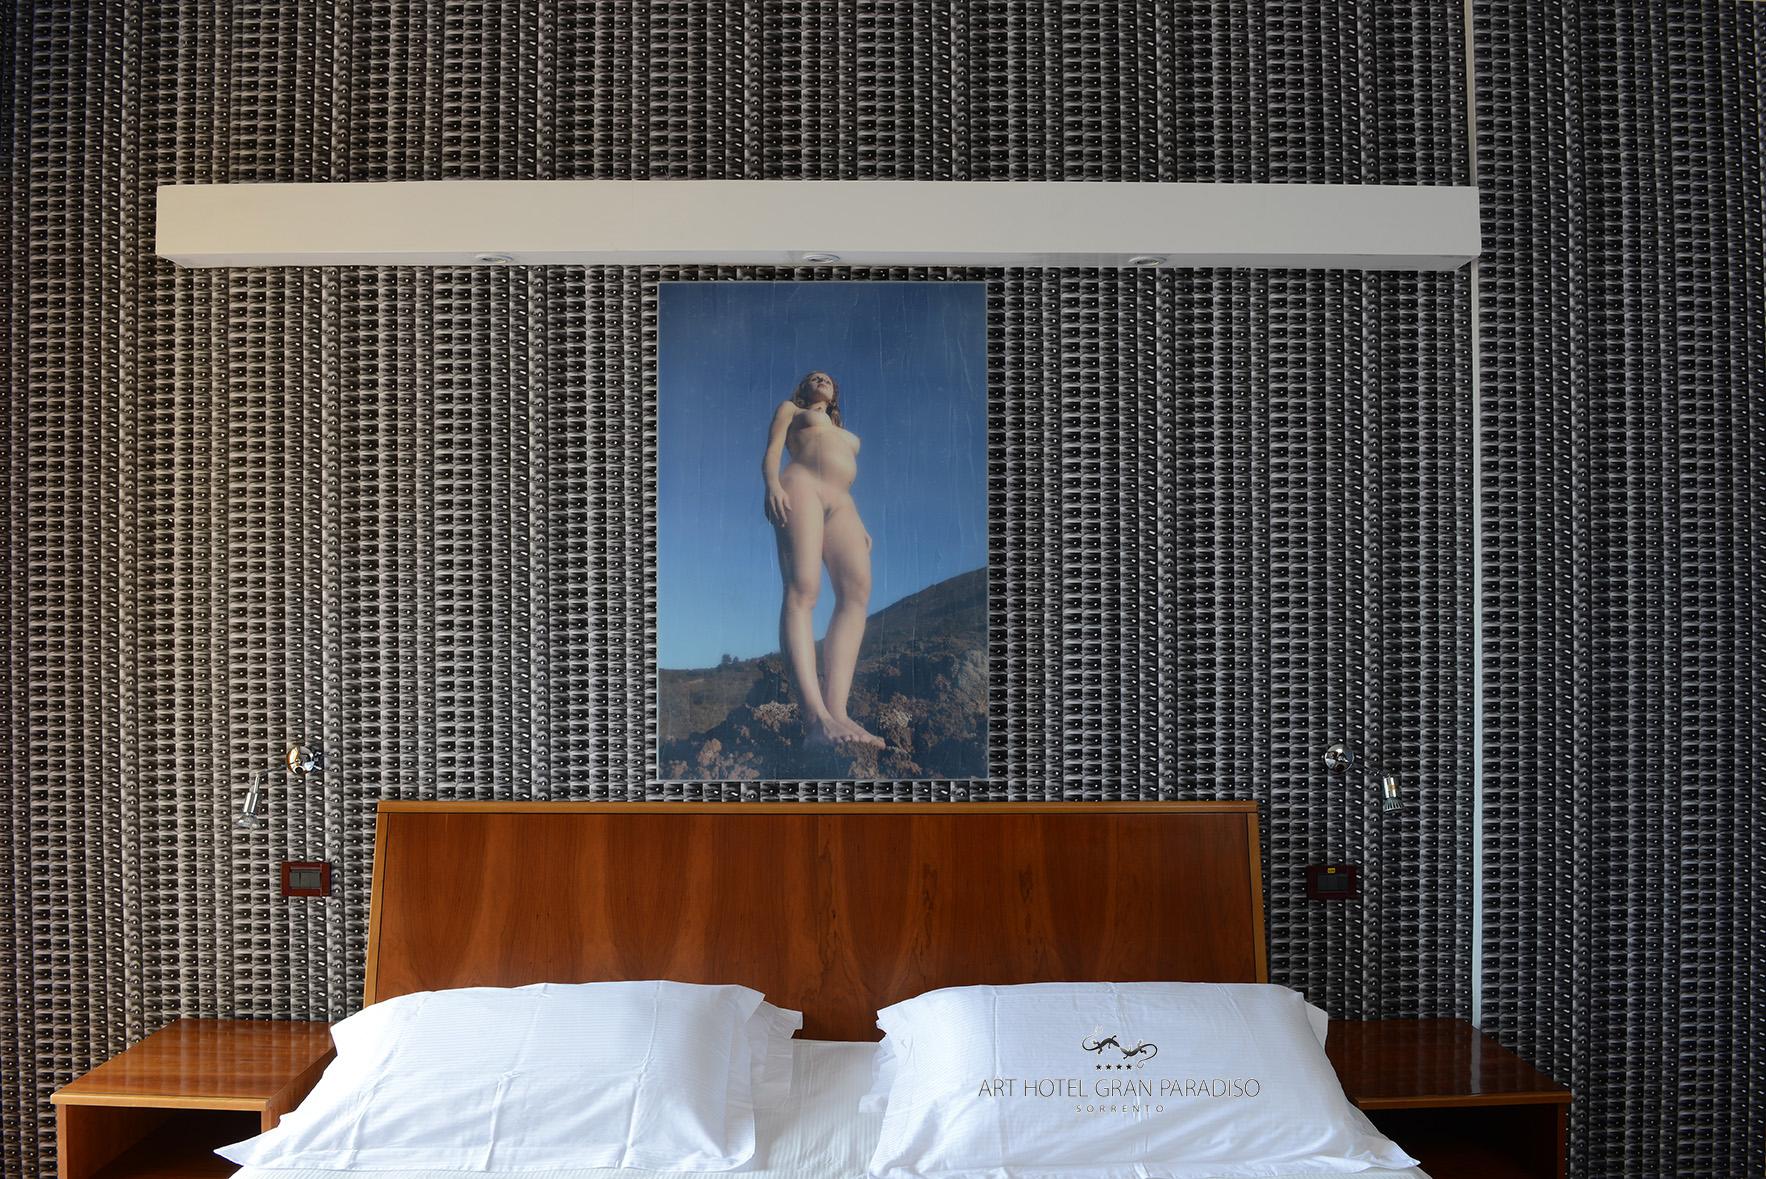 Art_Hotel_Gran_Paradiso_2013_101_Moio&Sivelli_3.jpg